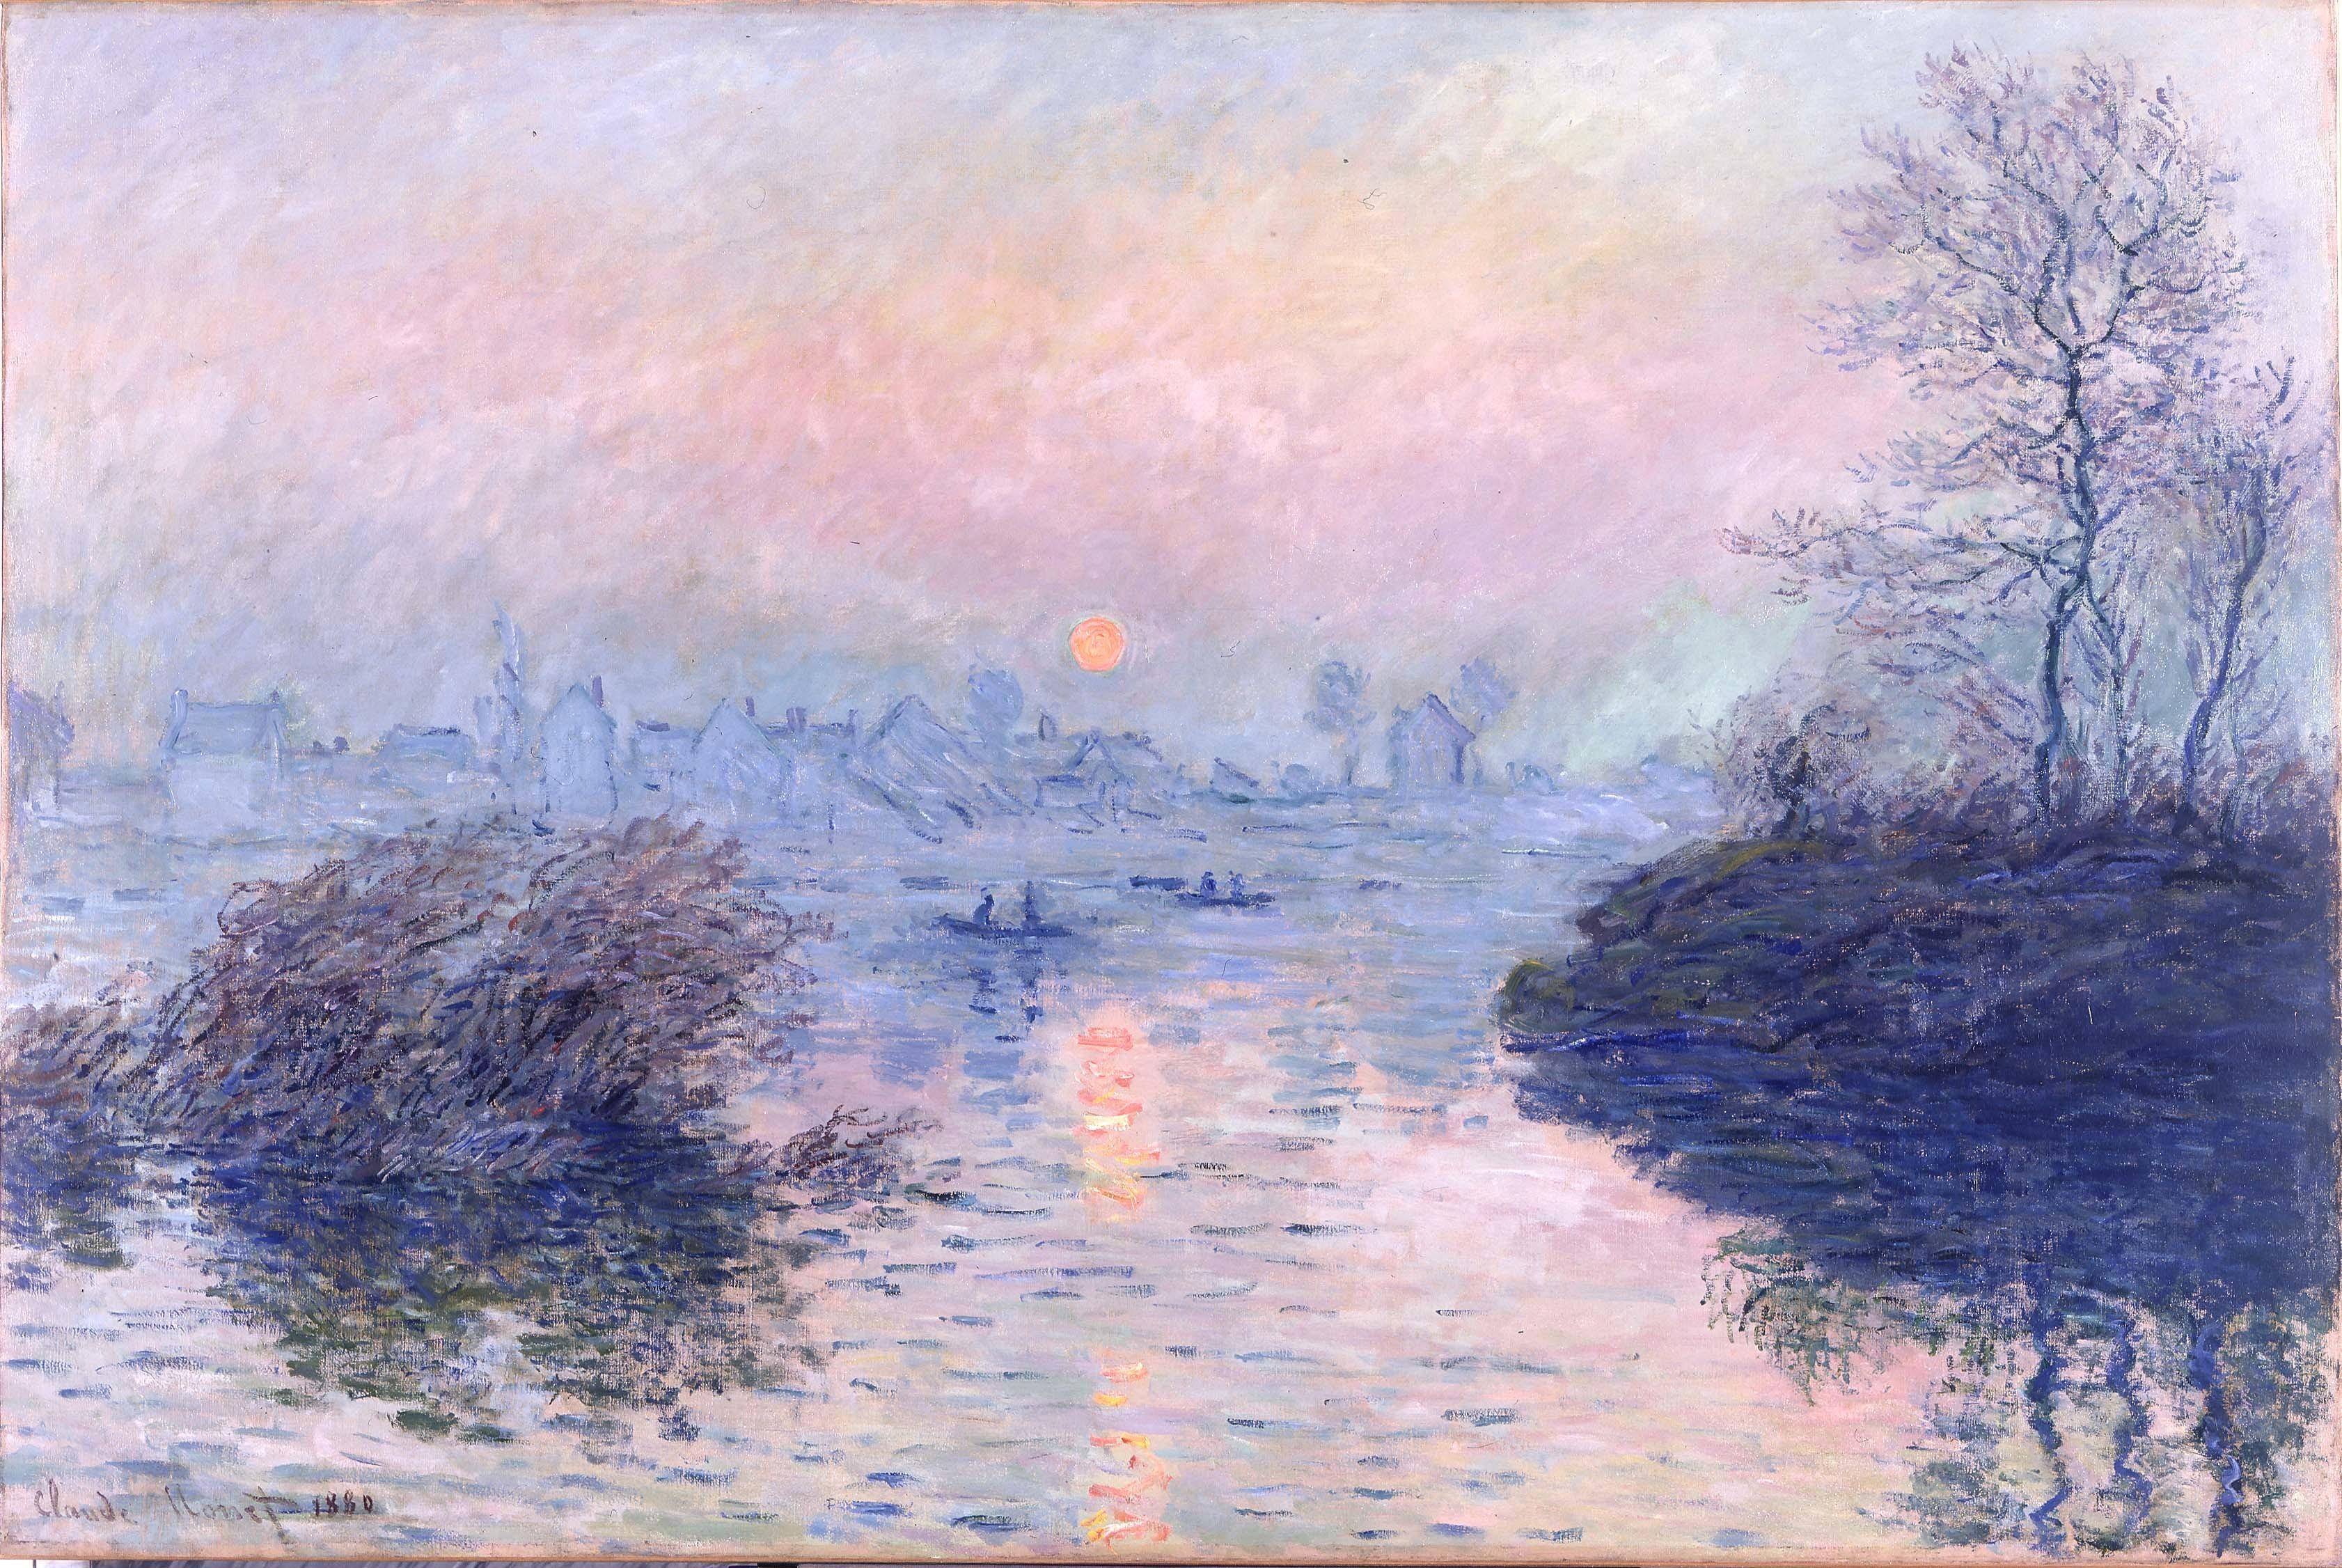 Claude Monet, 'Sunset on the Seine at Lavacourt', 1880, collection of Petit Palais